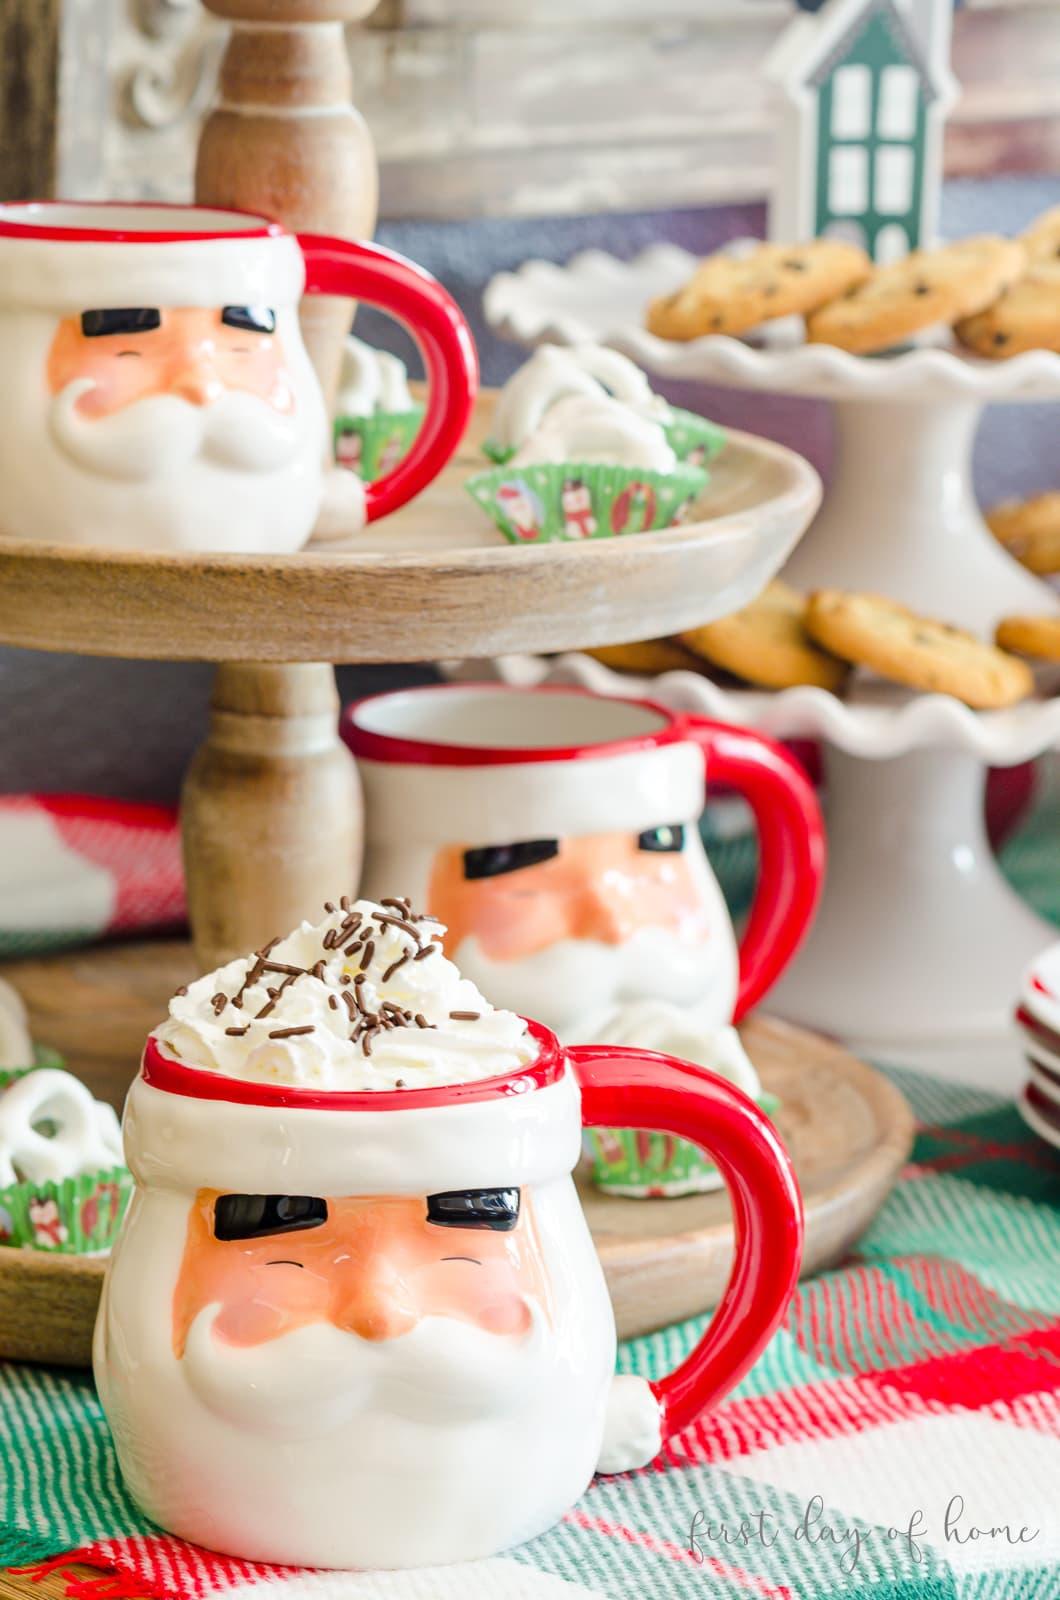 Santa mug with hot cocoa, whipped cream and chocolate sprinkles on hot cocoa bar